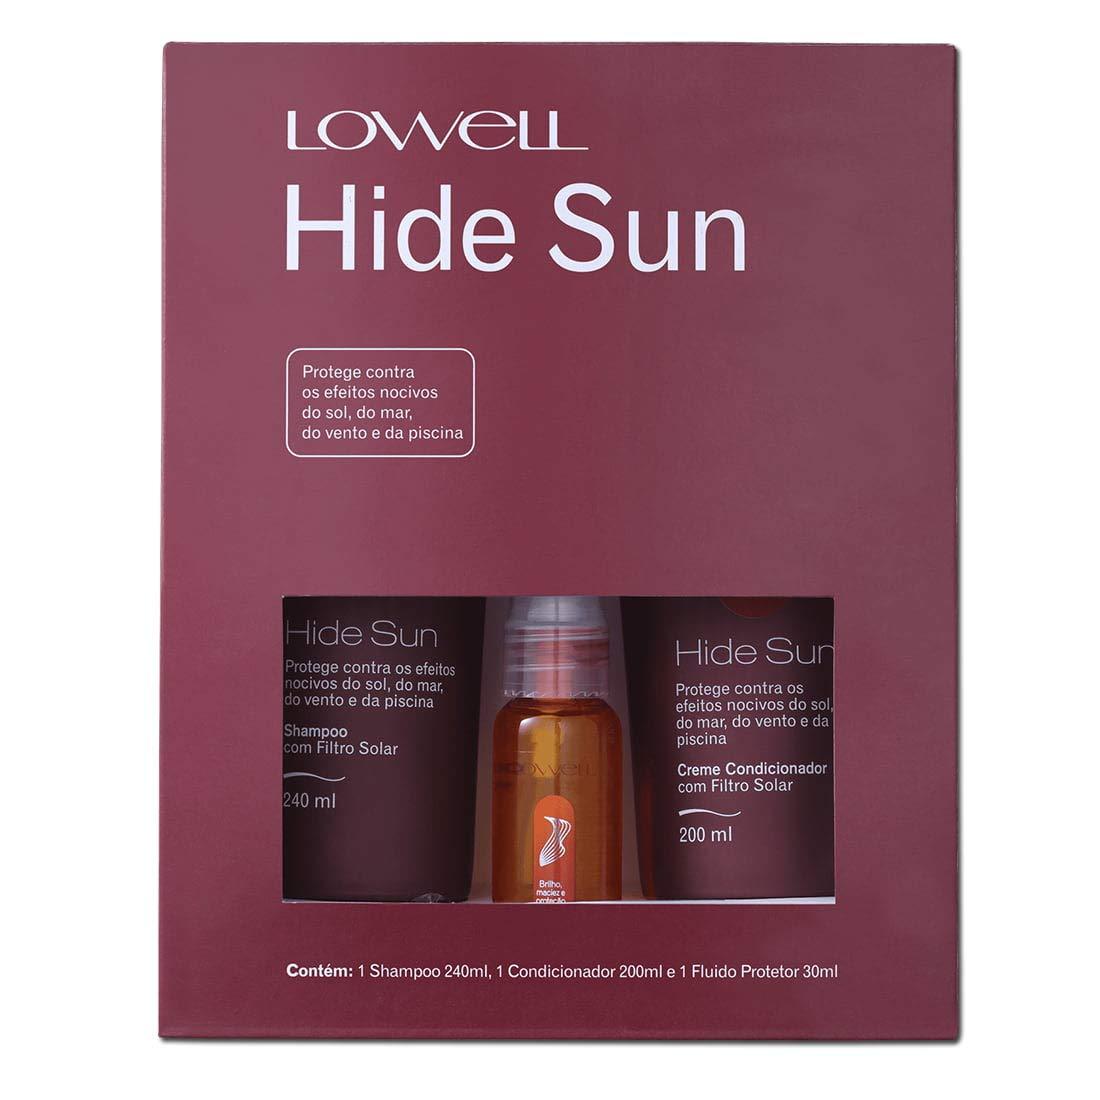 Lowell Kit Hide Sun Shampoo - 240ml + Condicionador - 200ml + Fluido - 30ml